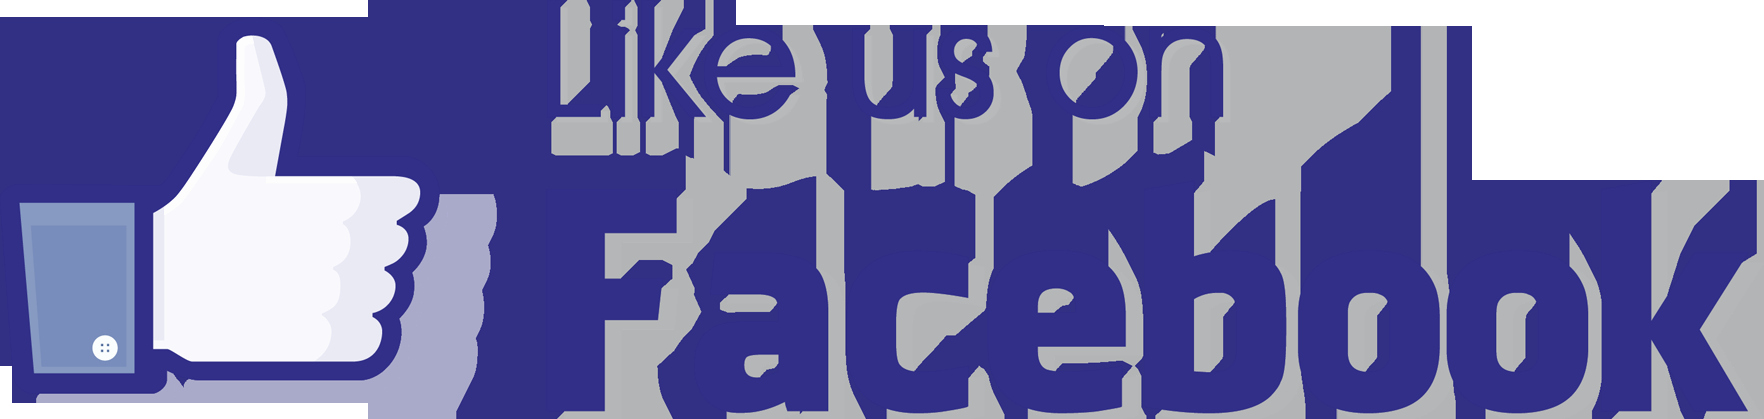 Like Us On Facebook Vector Elegant 500 Logo Latest Logo Fb Icon Gif Transparent Png